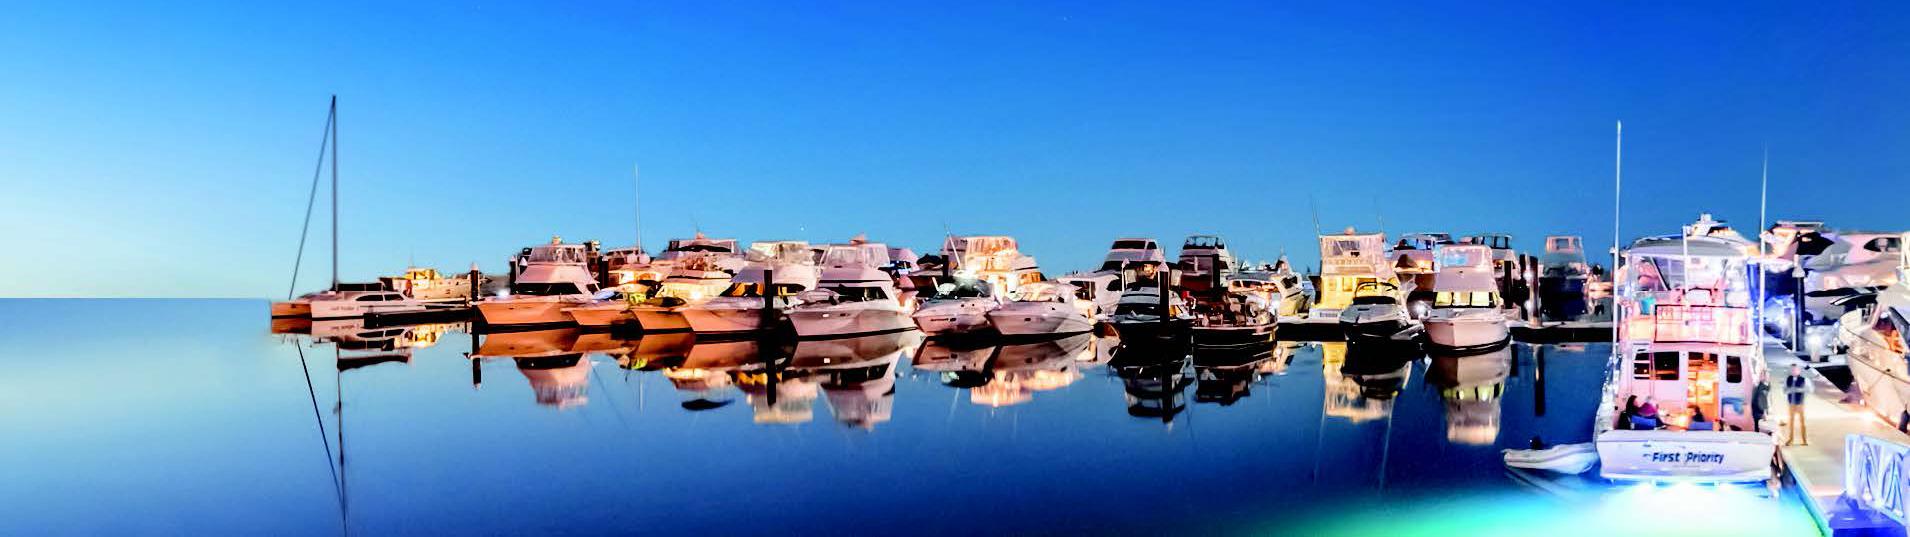 pelican waters marina